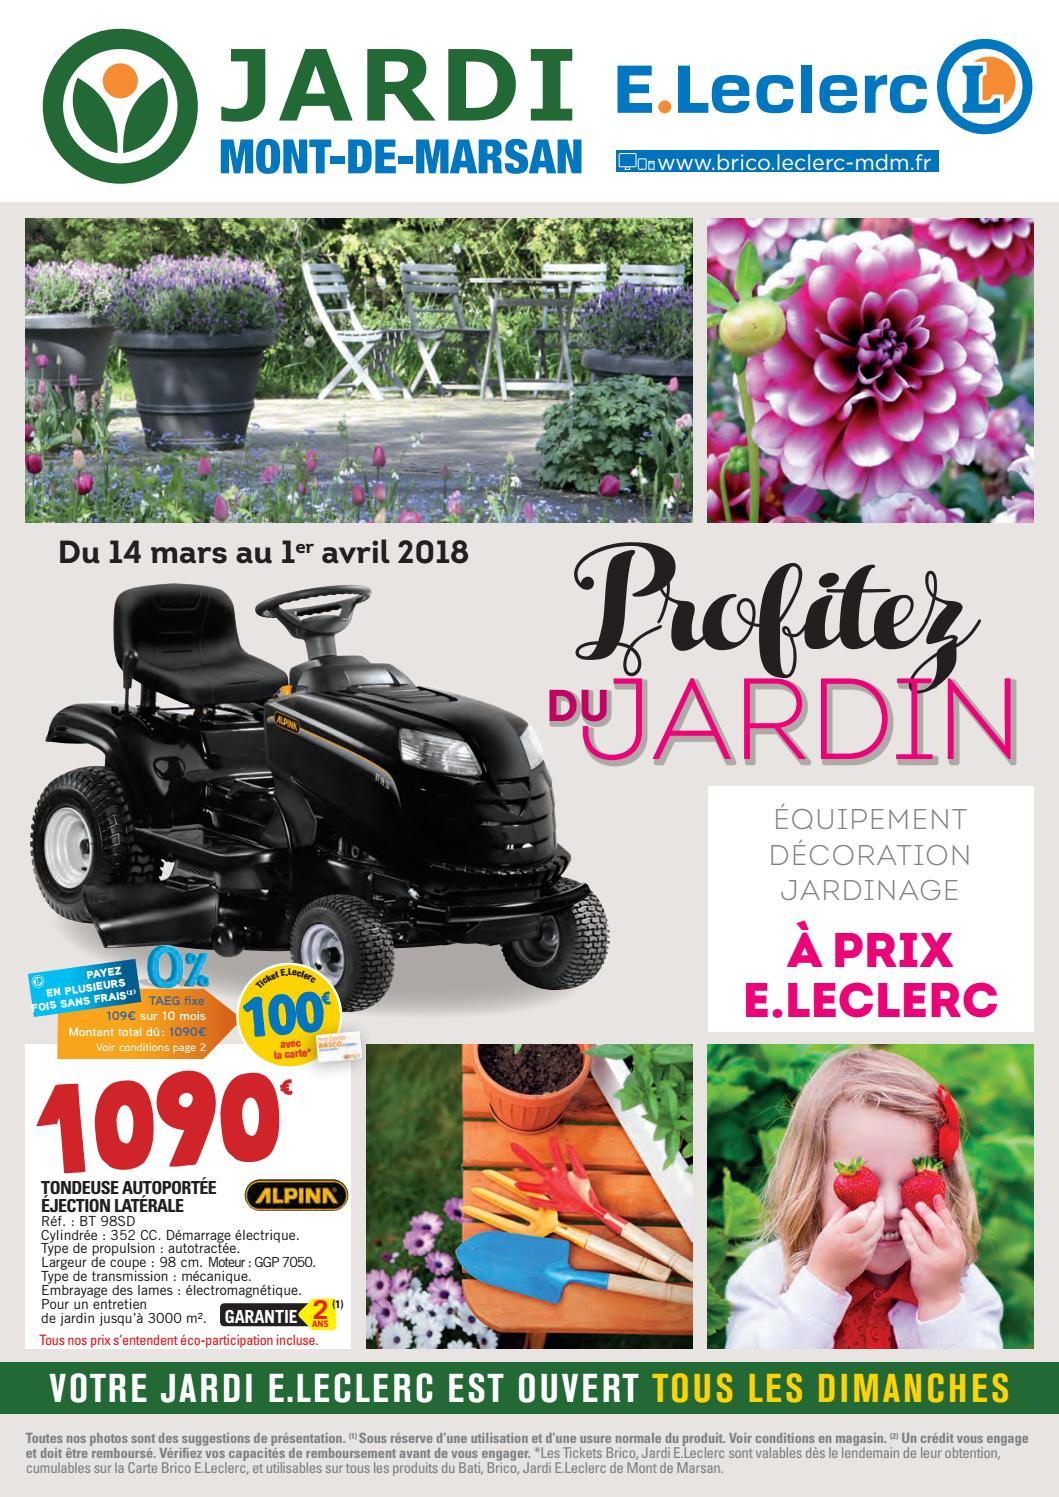 Catalogue Jardin - Jardi E.leclerc By Chou Magazine - Issuu encequiconcerne Soldes Salon De Jardin Leclerc